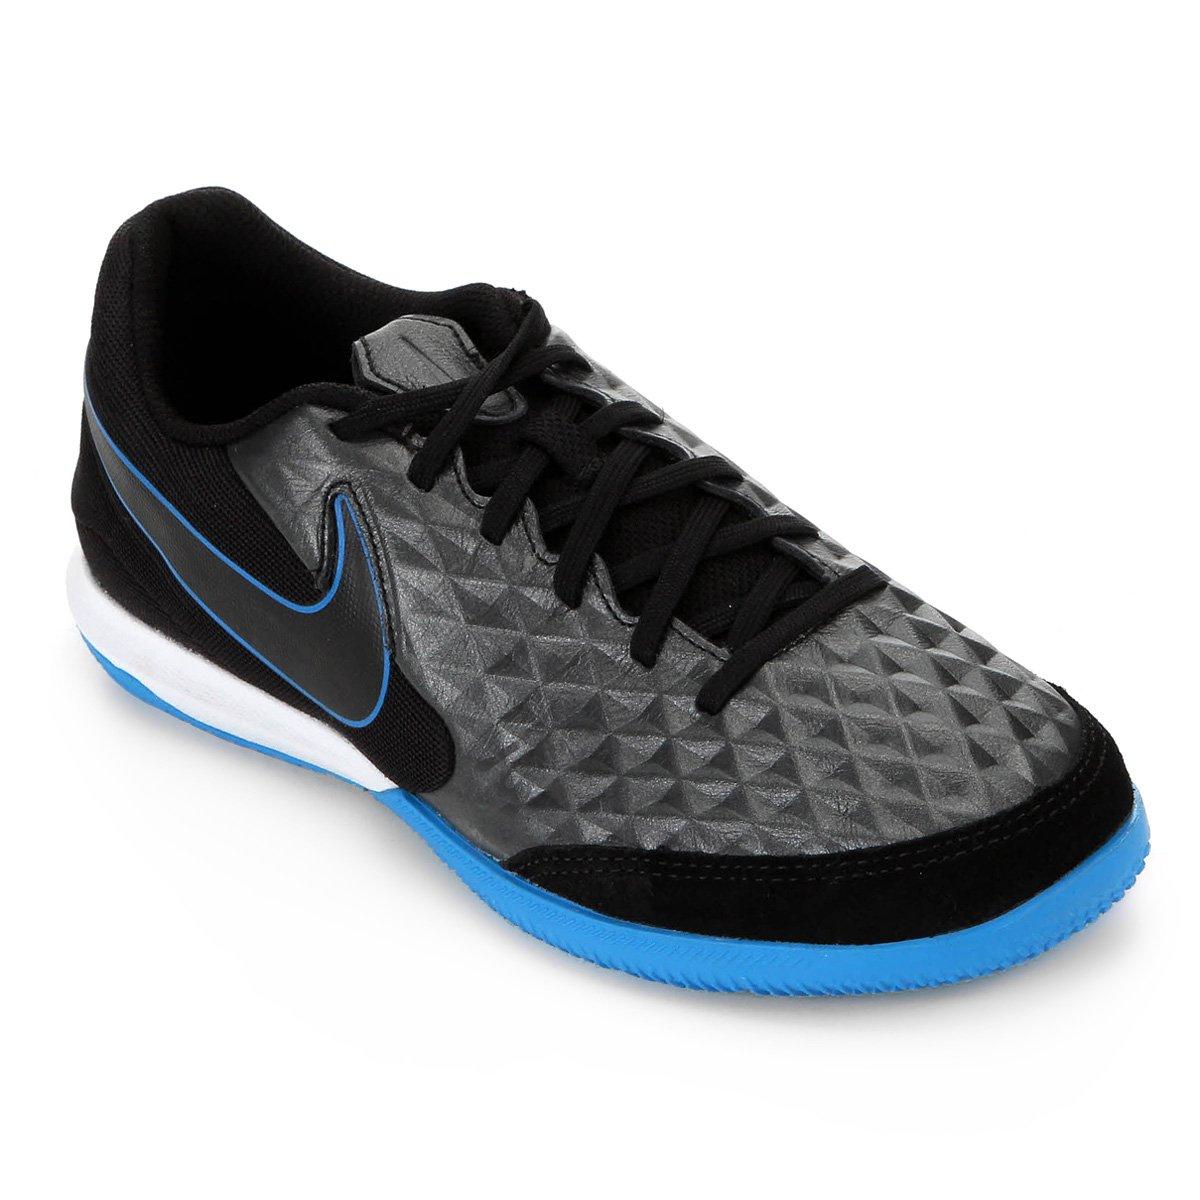 premium selection 140a5 61ef9 Chuteira Futsal Nike Tiempo Legend 8 Academy IC - Preto e Azul